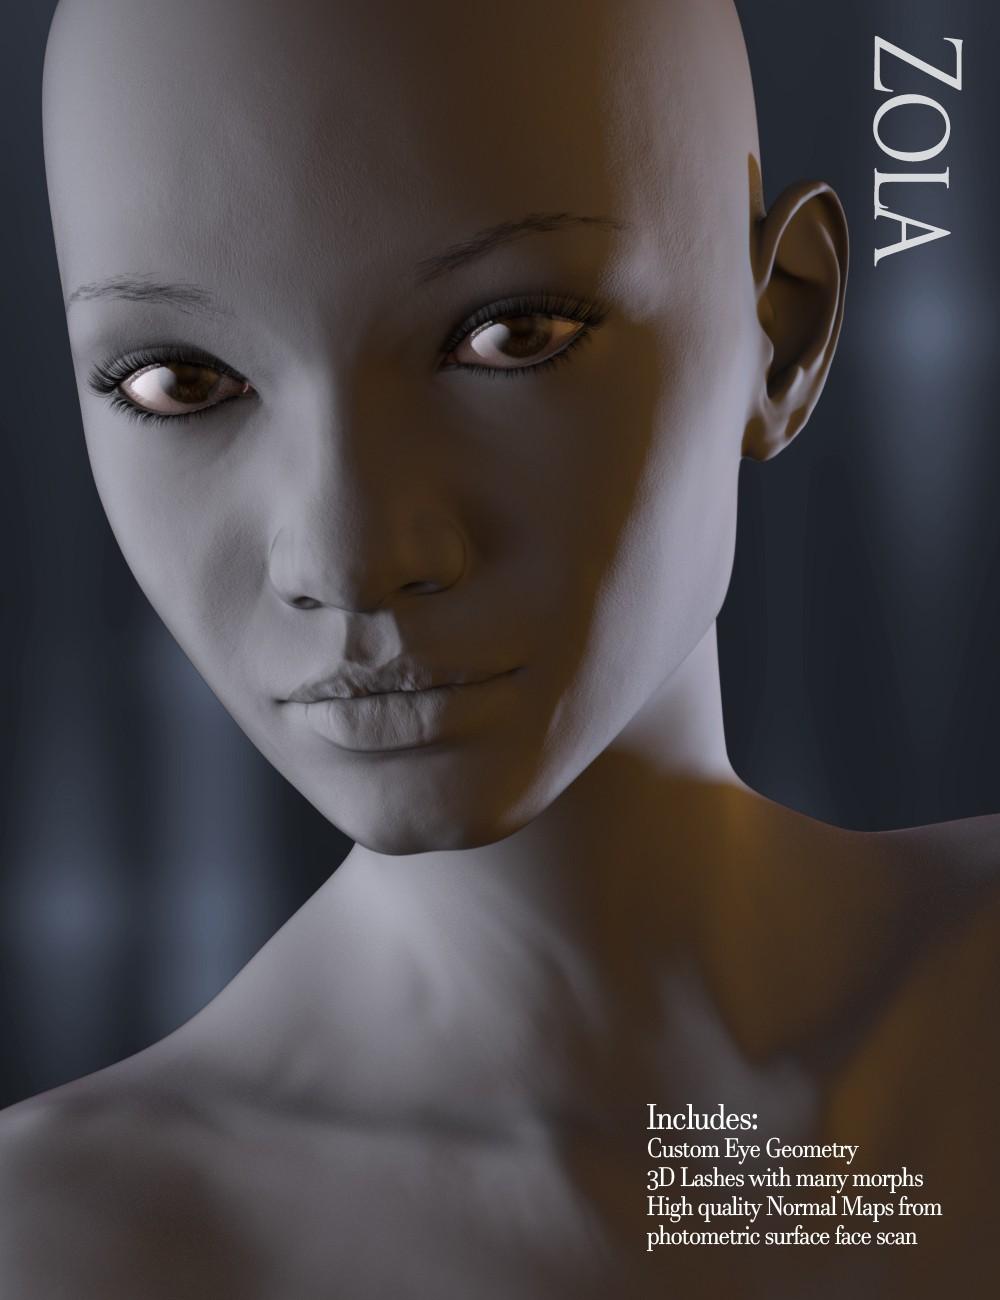 Download DAZ Studio 3 for FREE!: DAZ 3D - Zola HD for